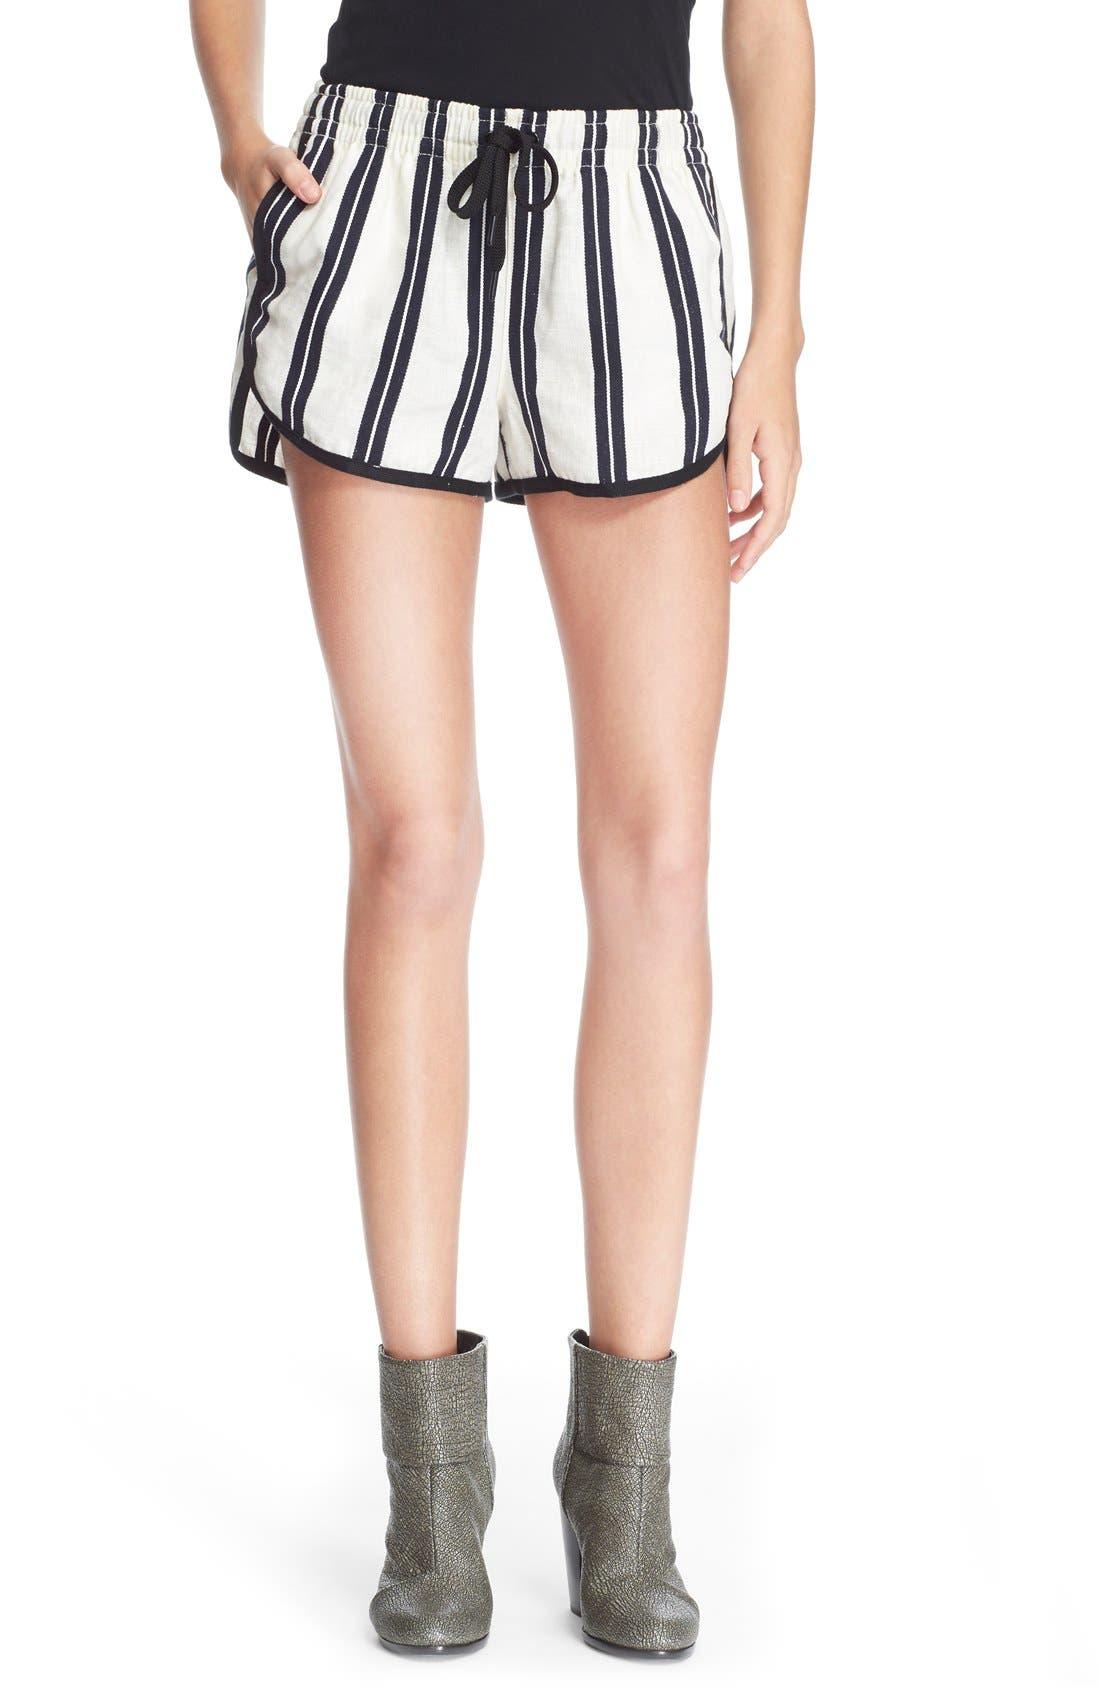 Alternate Image 1 Selected - rag & bone/JEAN 'Beach' High Rise Stripe Shorts